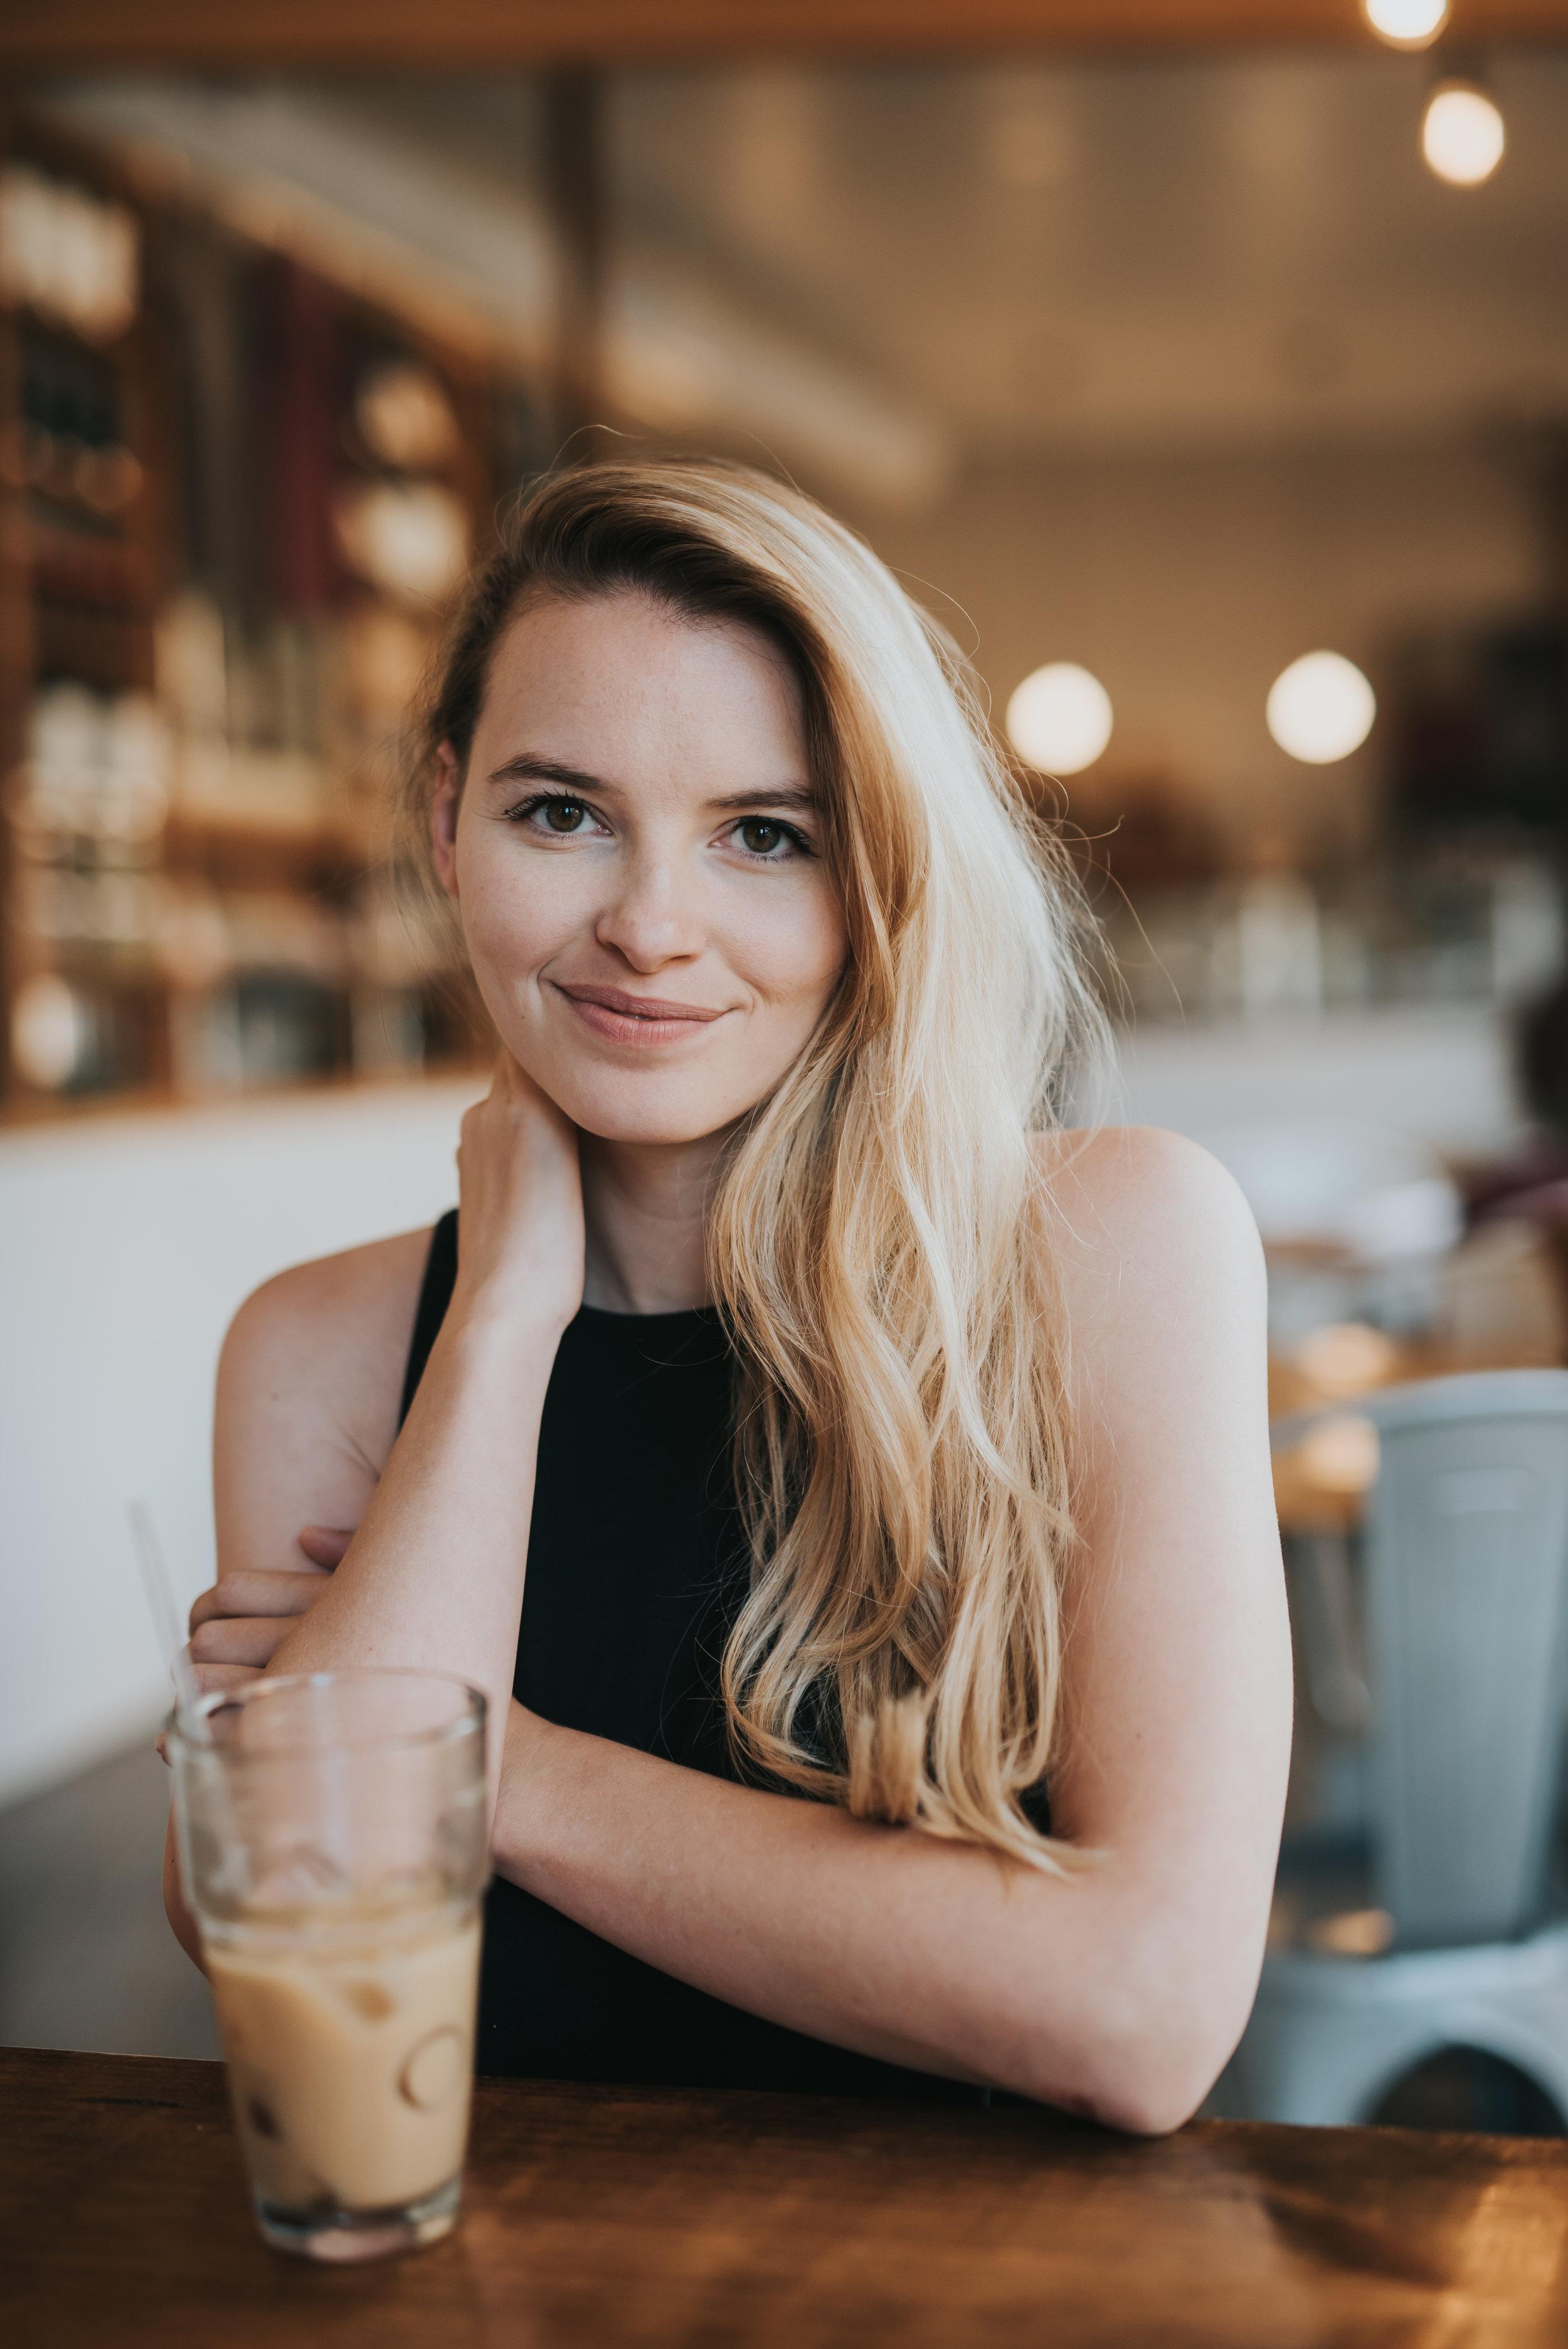 Keiley Michelle Mckean - Photographer, Editor, Big Baller